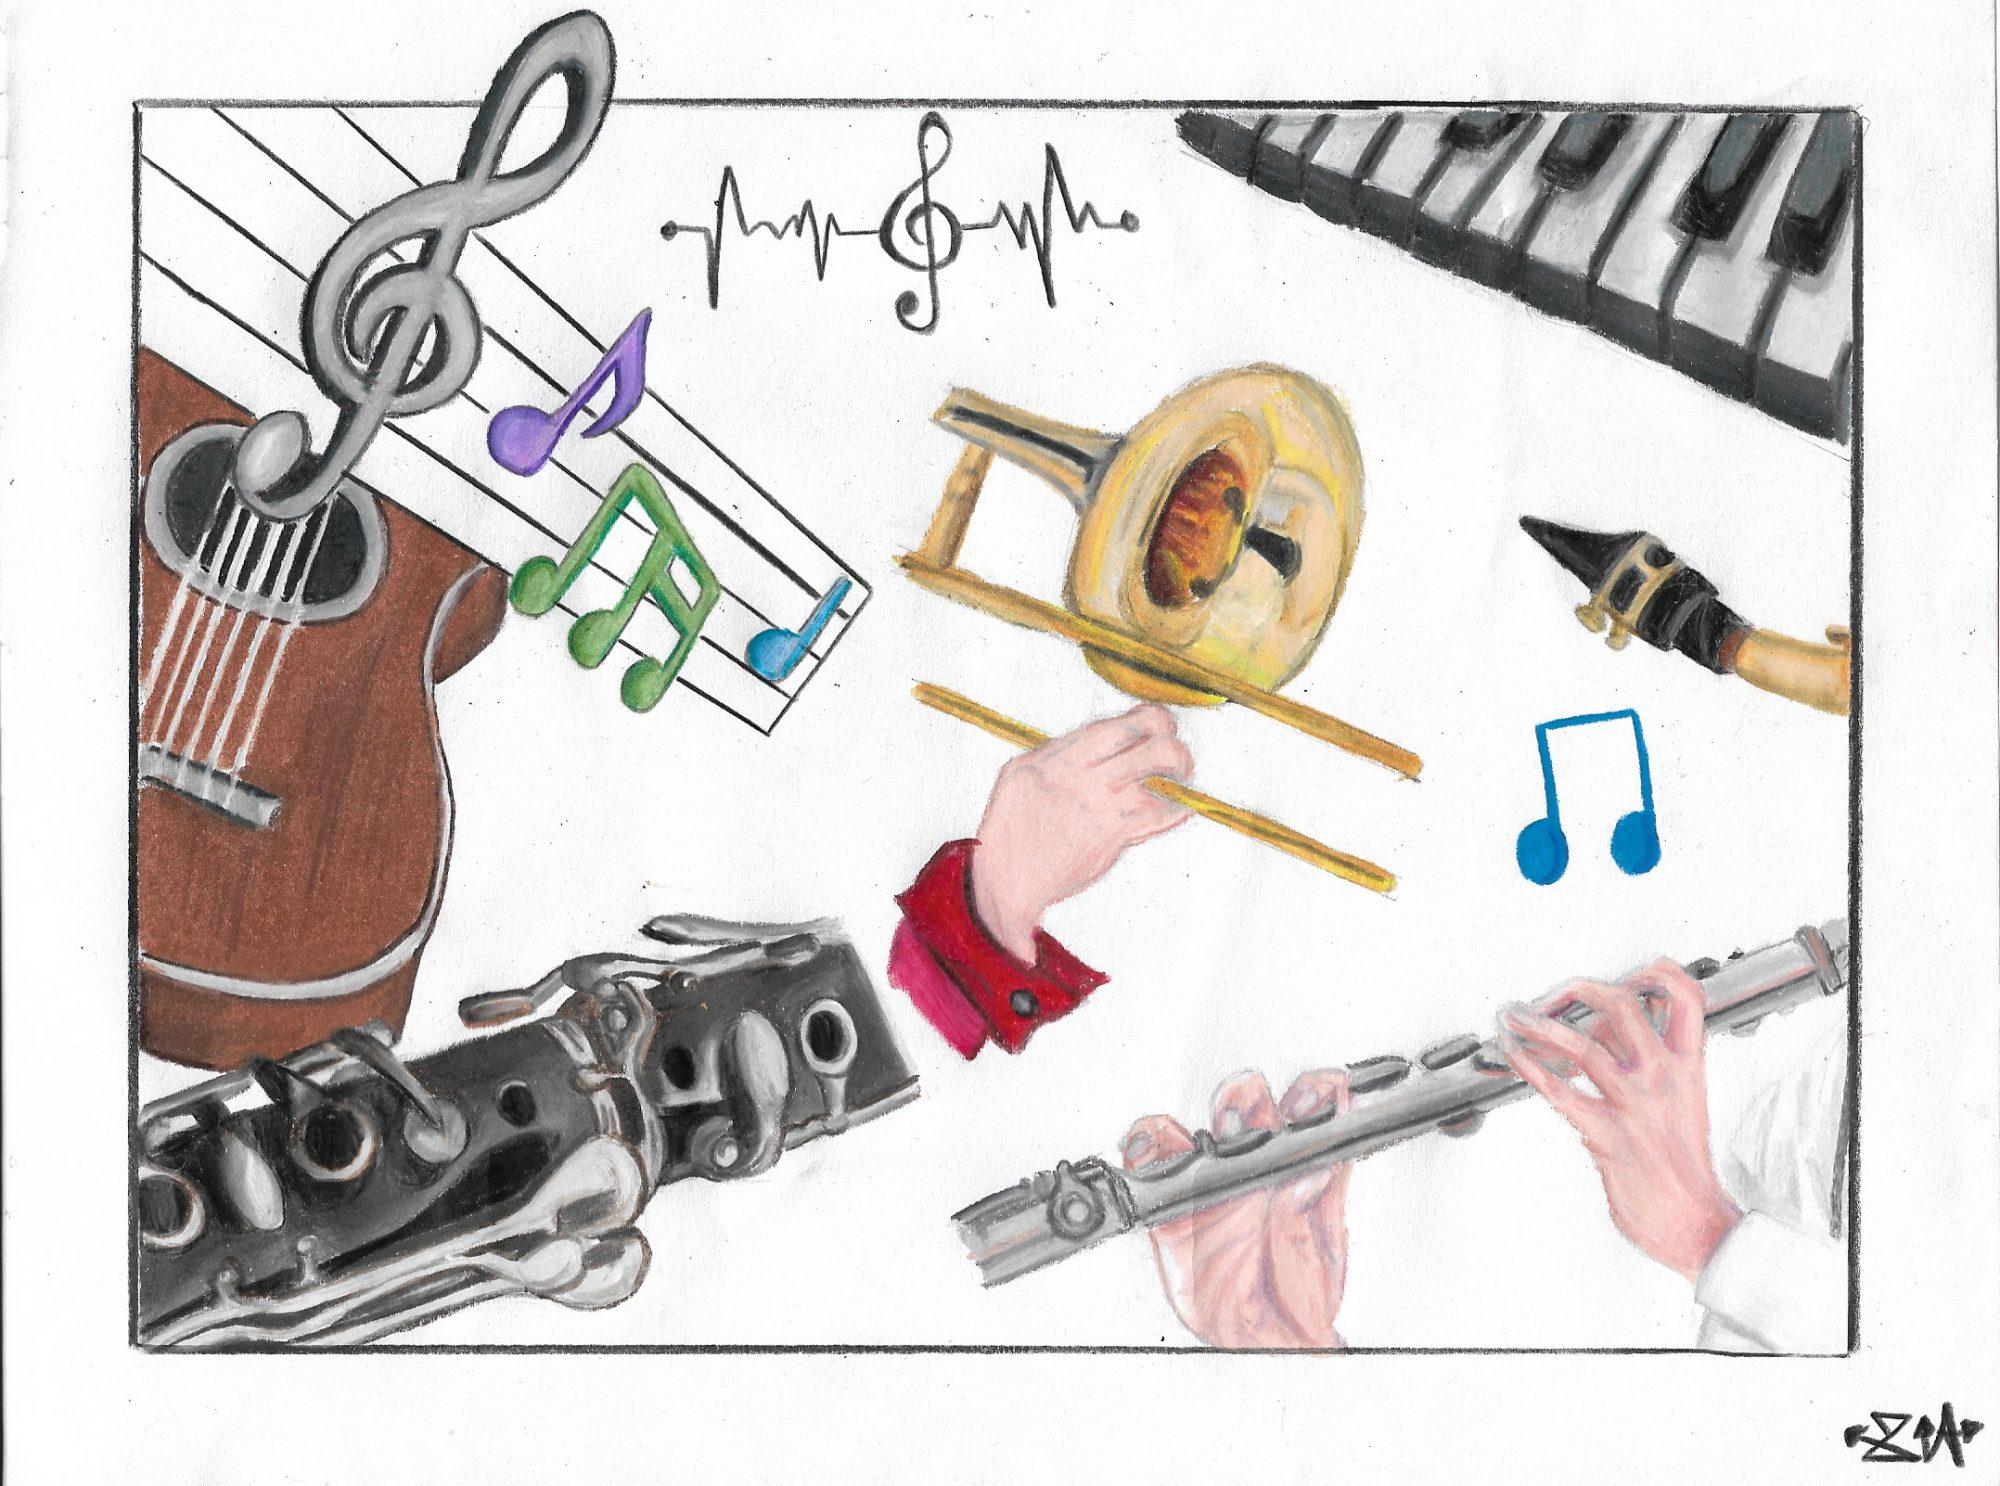 Ecole de musique Hartmannswiller